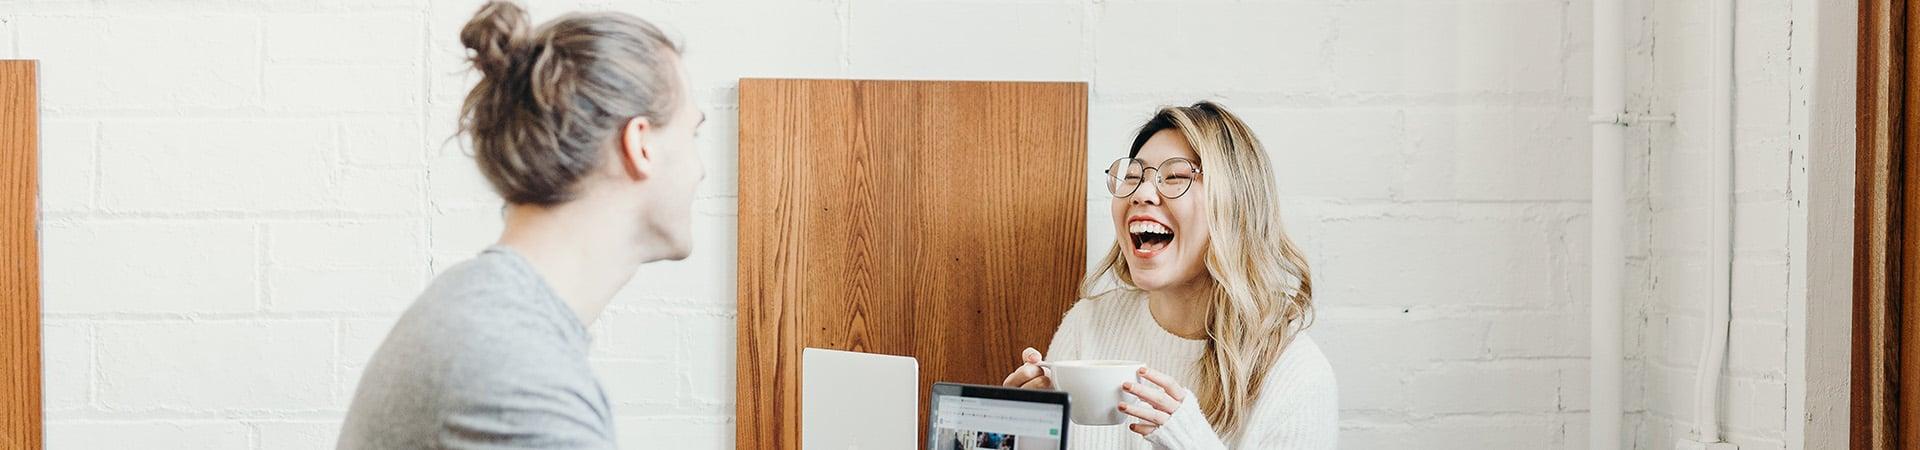 two-people-talking-laughing